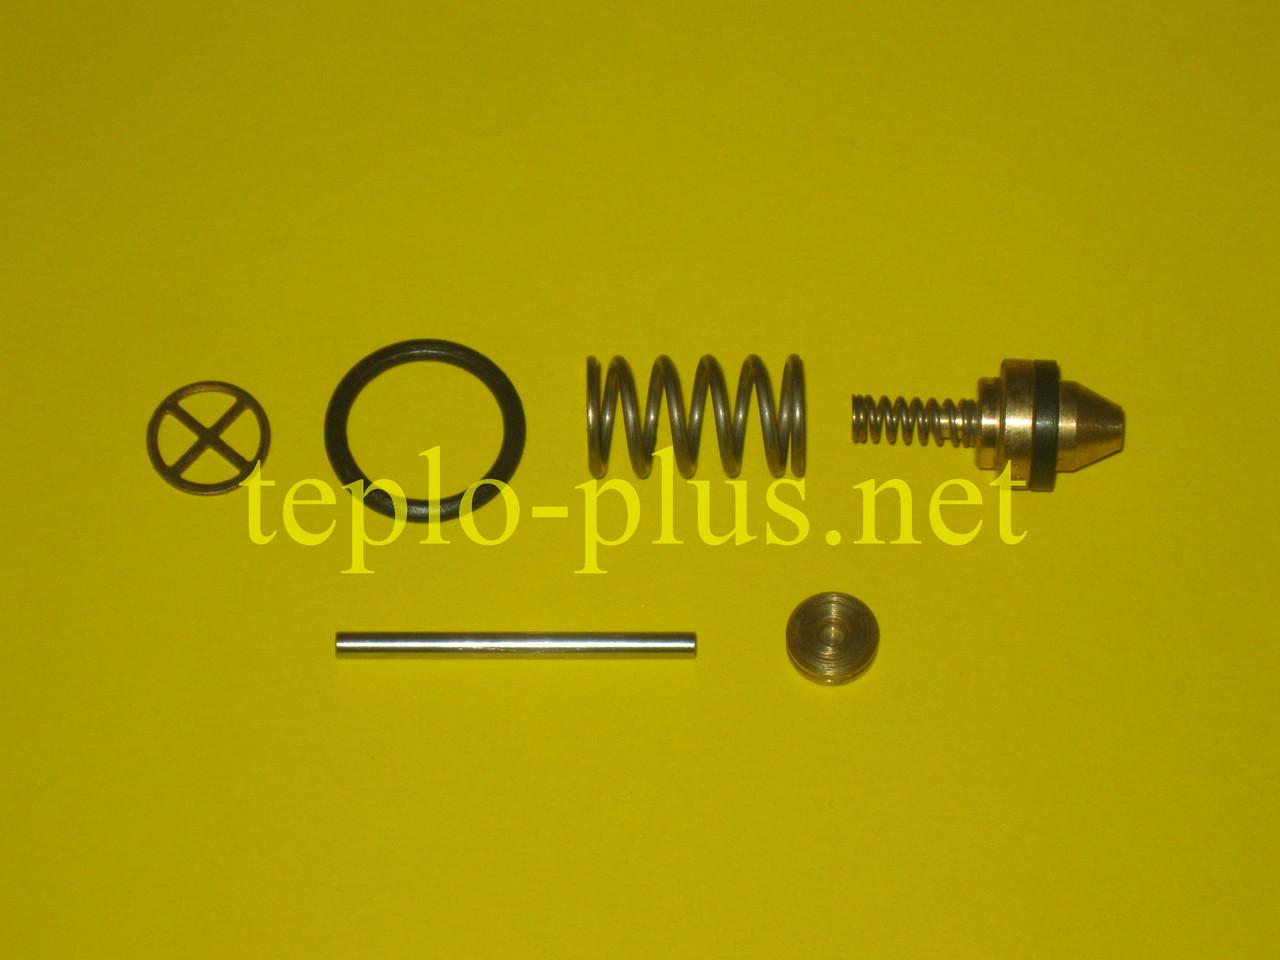 Ремкомплект газо-водяного блока Beretta Idrabagno Aqua 11, 11 i, 14, 14 i